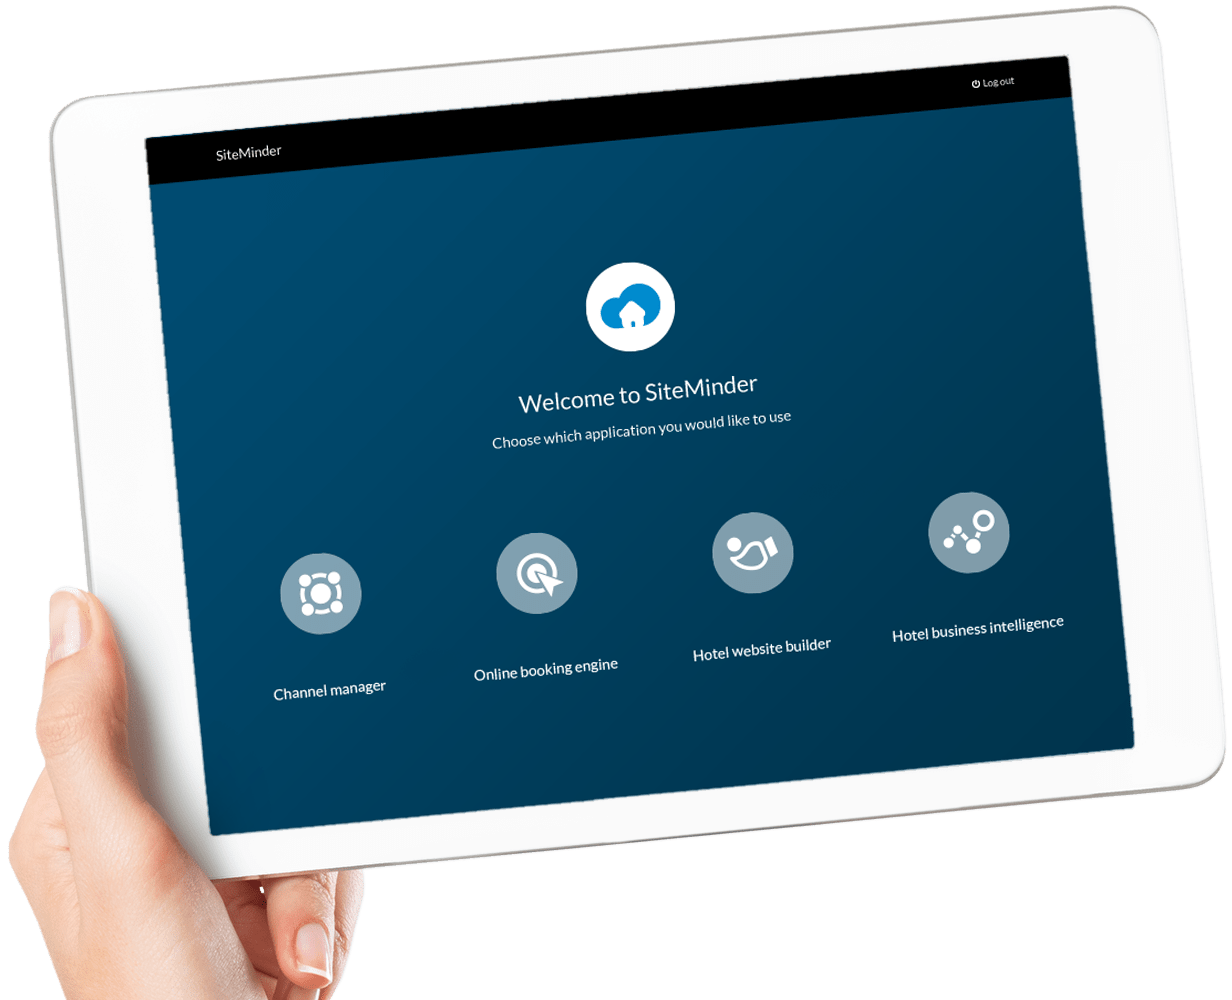 La plataforma de SiteMinder